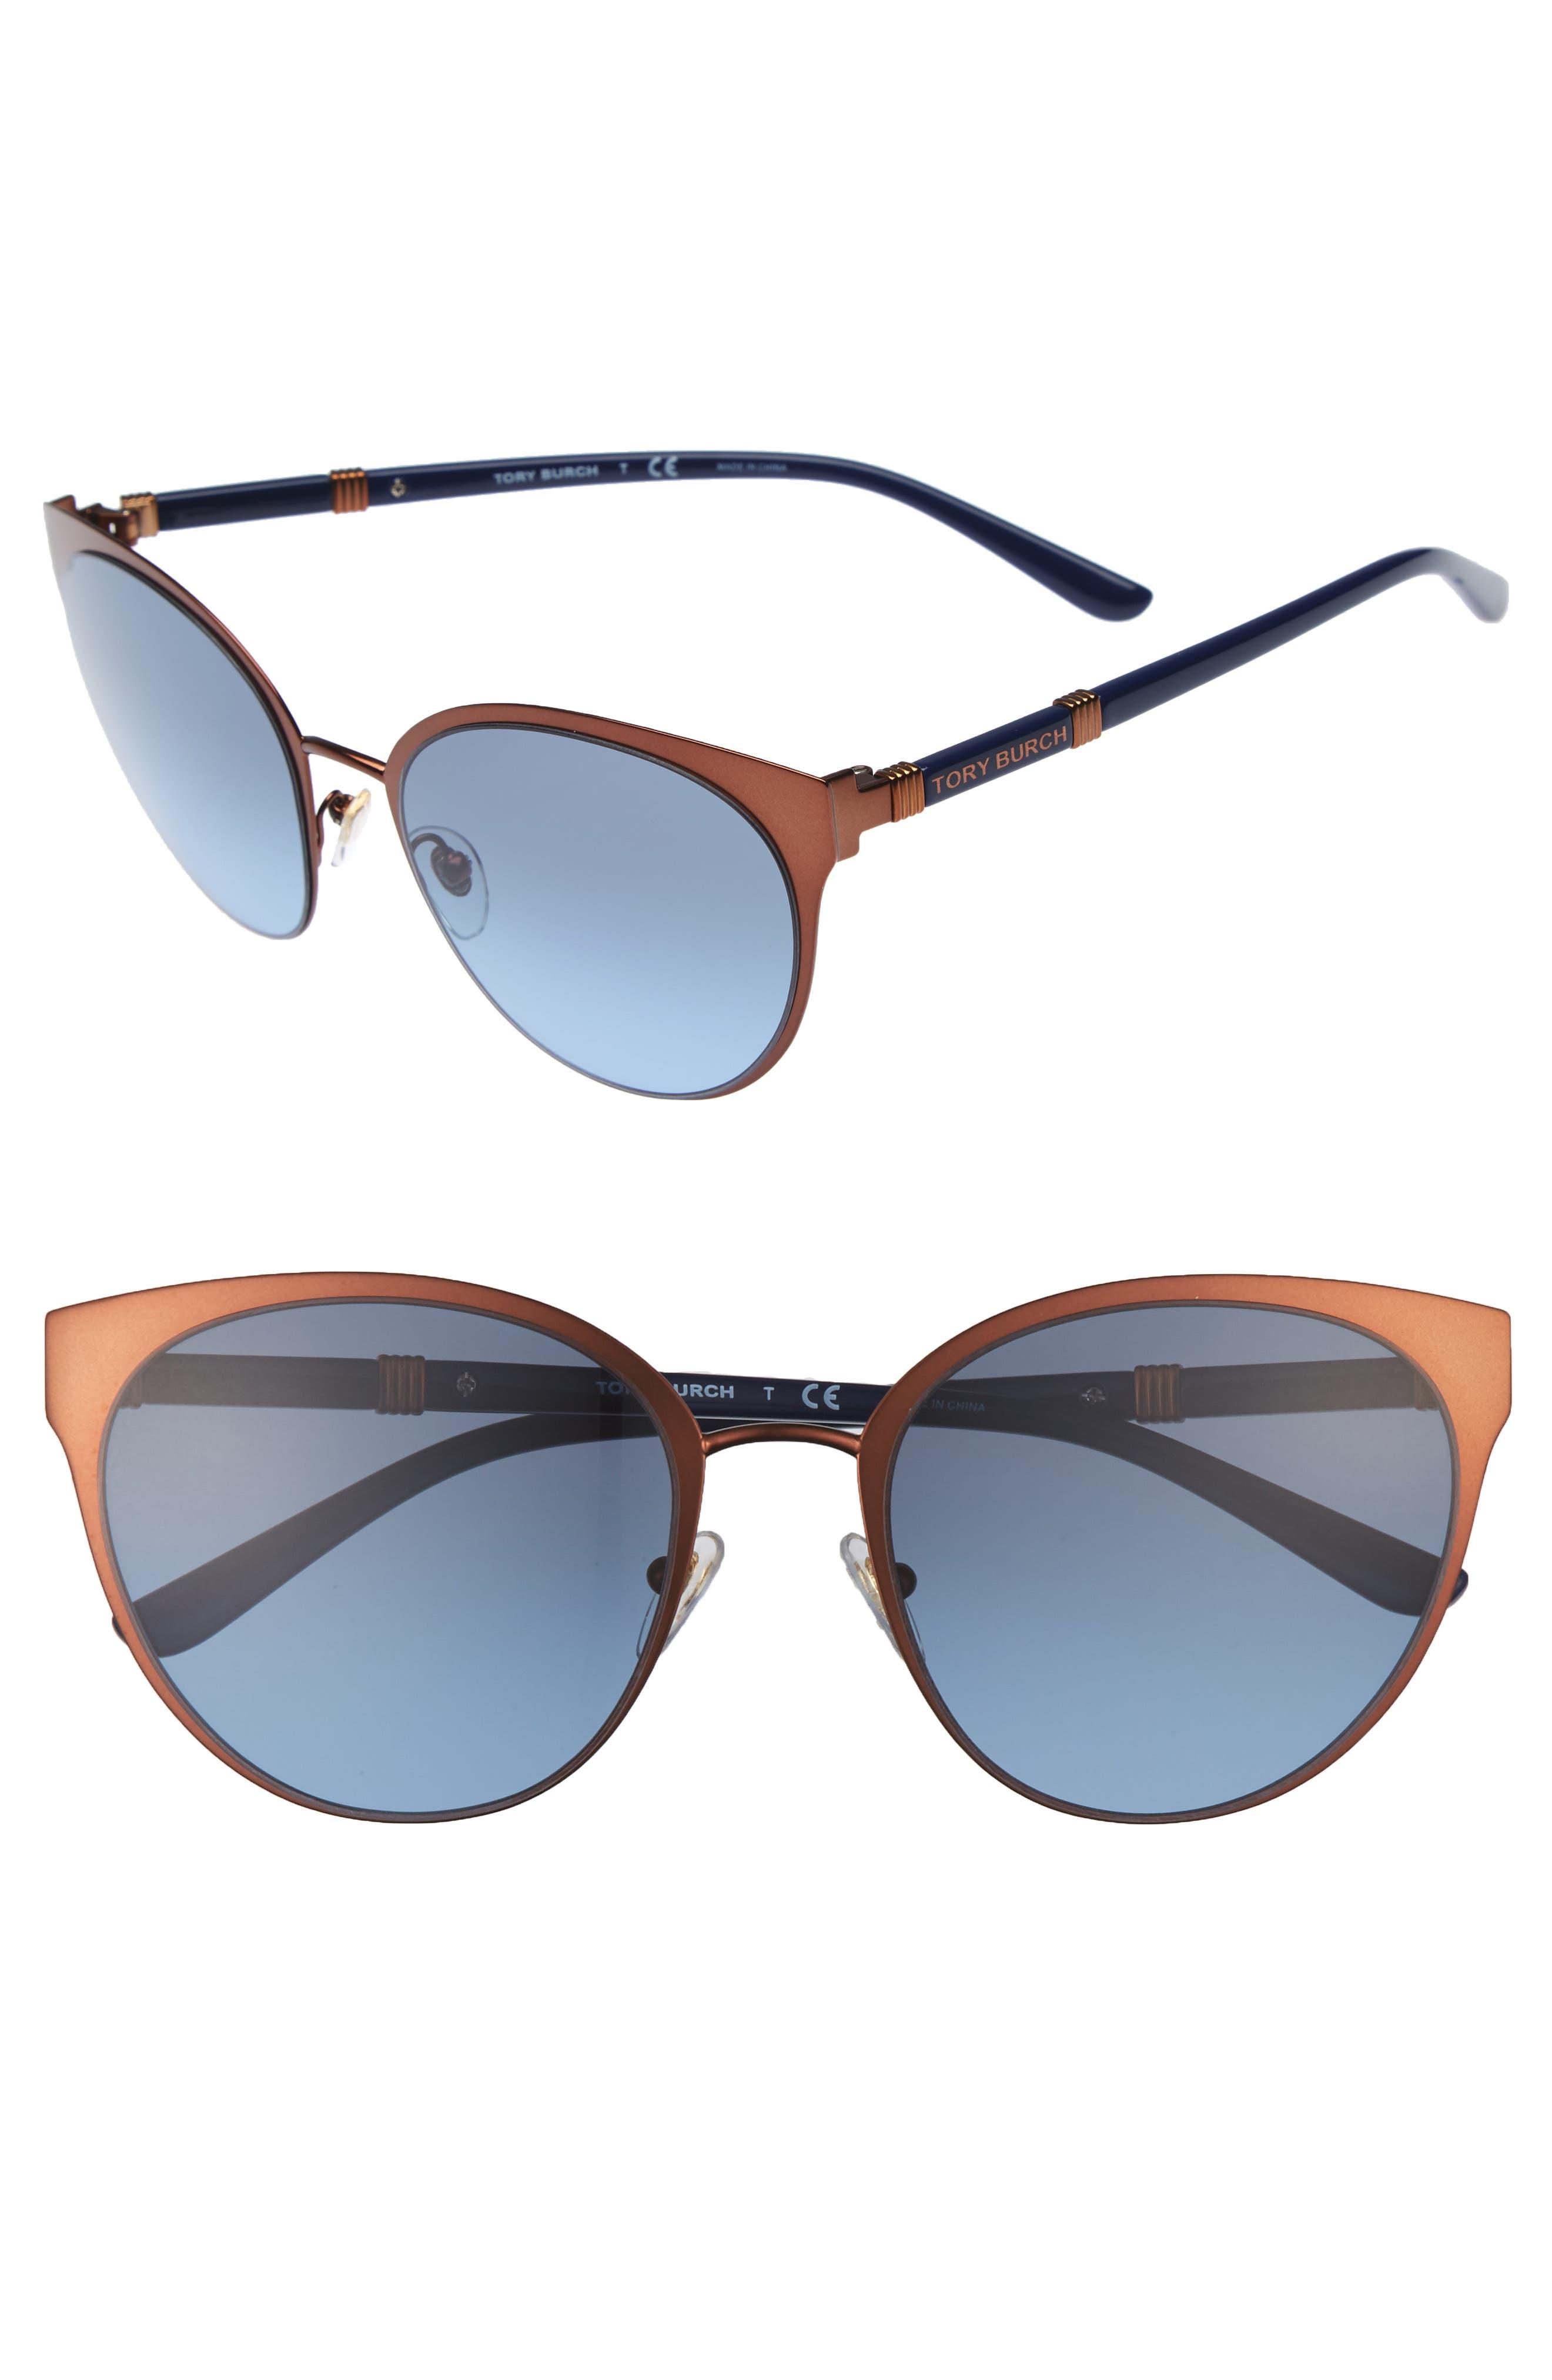 55mm Cat Eye Sunglasses,                             Main thumbnail 1, color,                             220